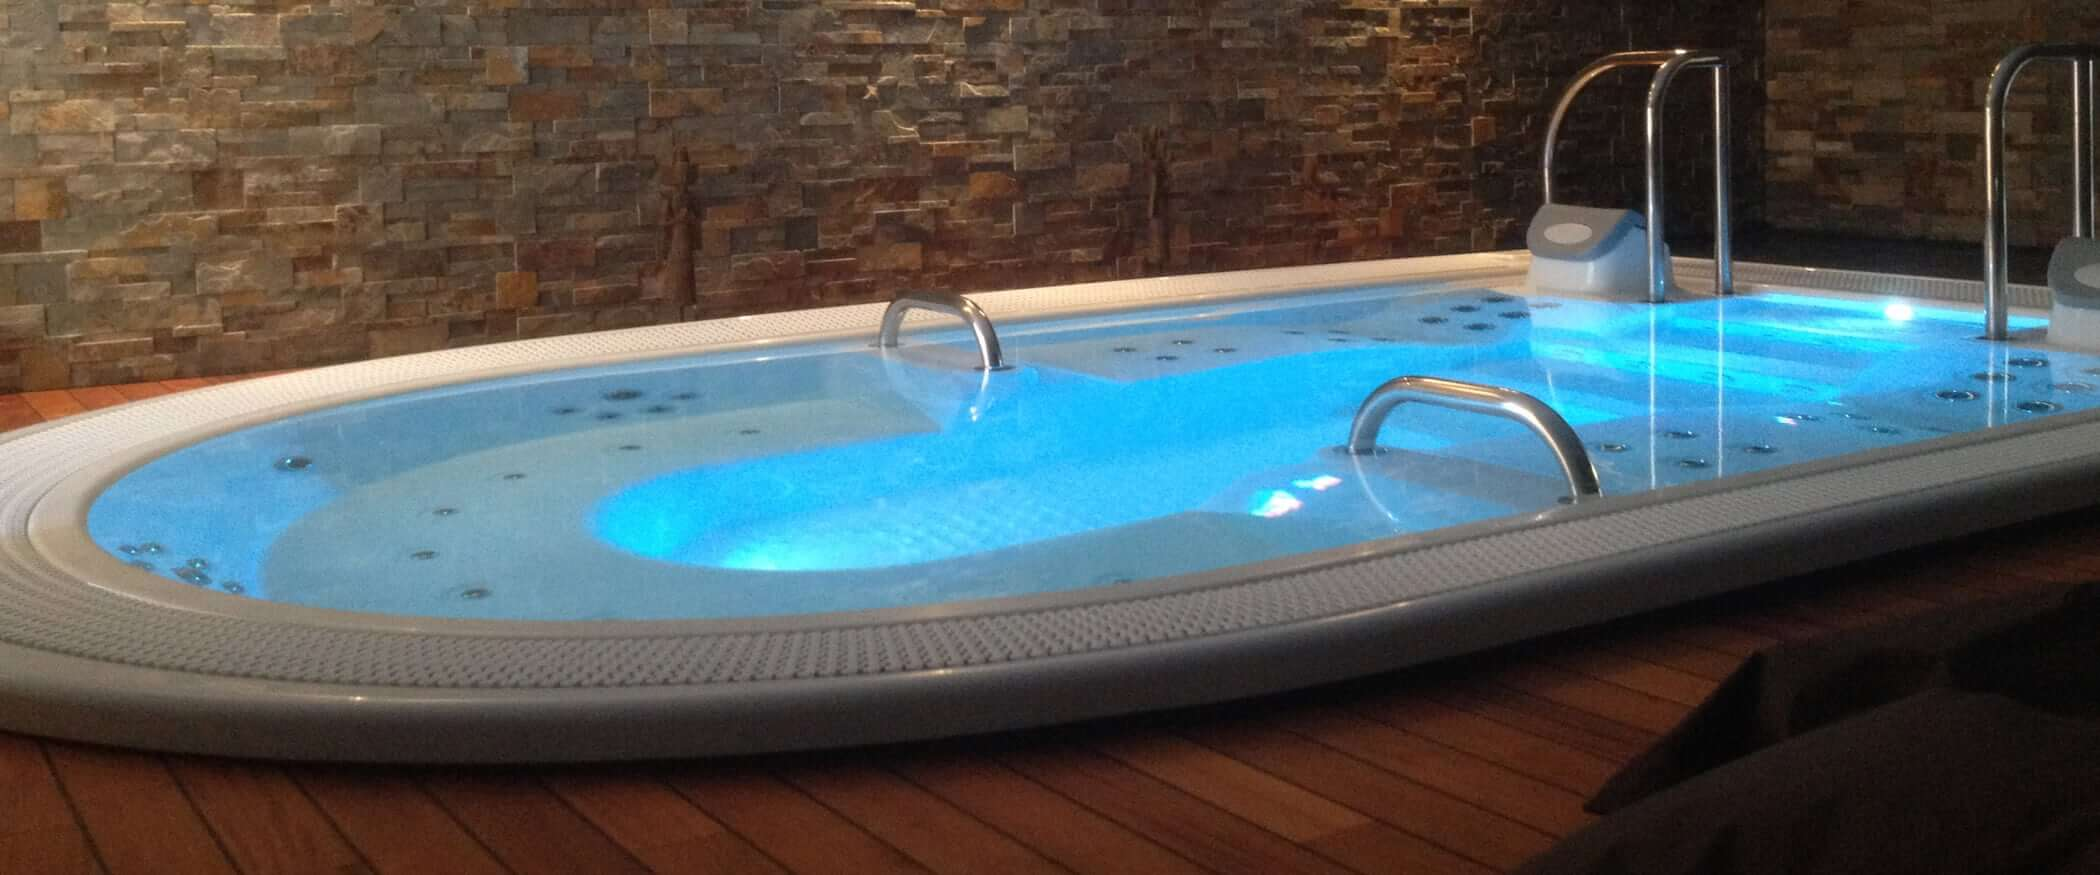 Buy the overflow, design and luxury hot tub Izaro - Aquavia Spa UK